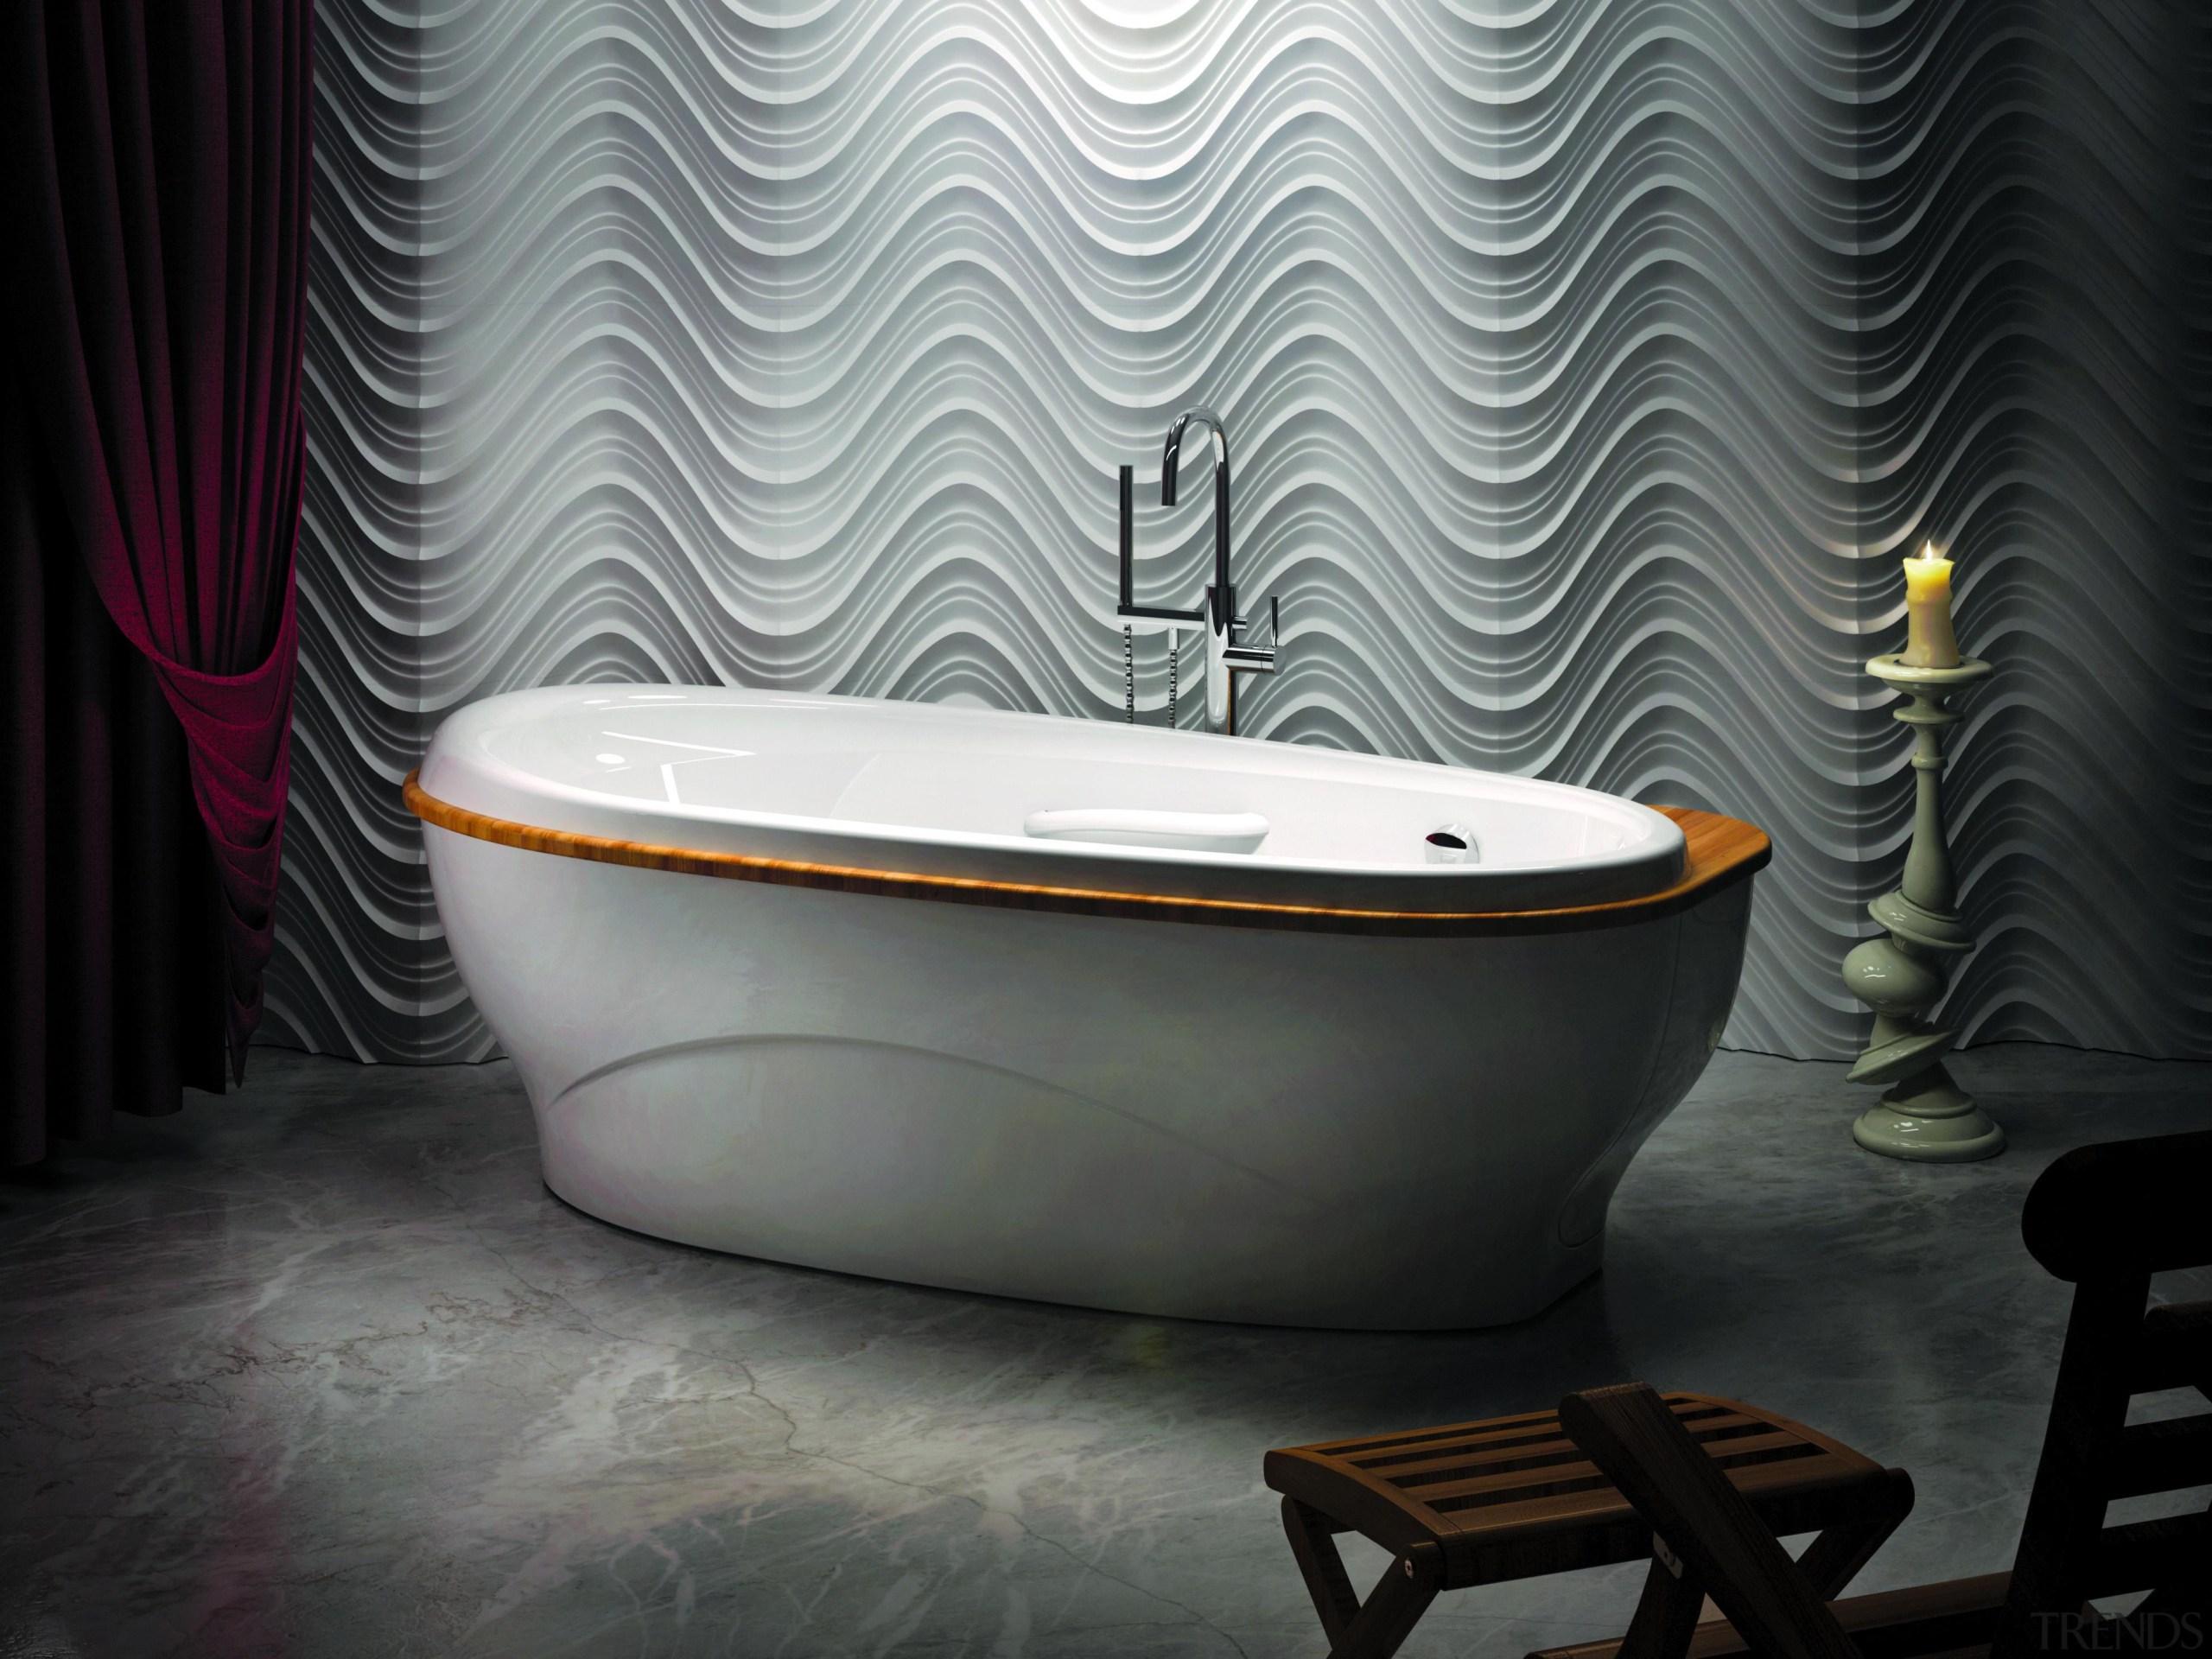 ayoura 7838 fs hr.jpg - ayoura_7838_fs_hr.jpg - bathroom bathroom, bathtub, ceramic, floor, interior design, plumbing fixture, product, product design, toilet seat, wall, black, gray